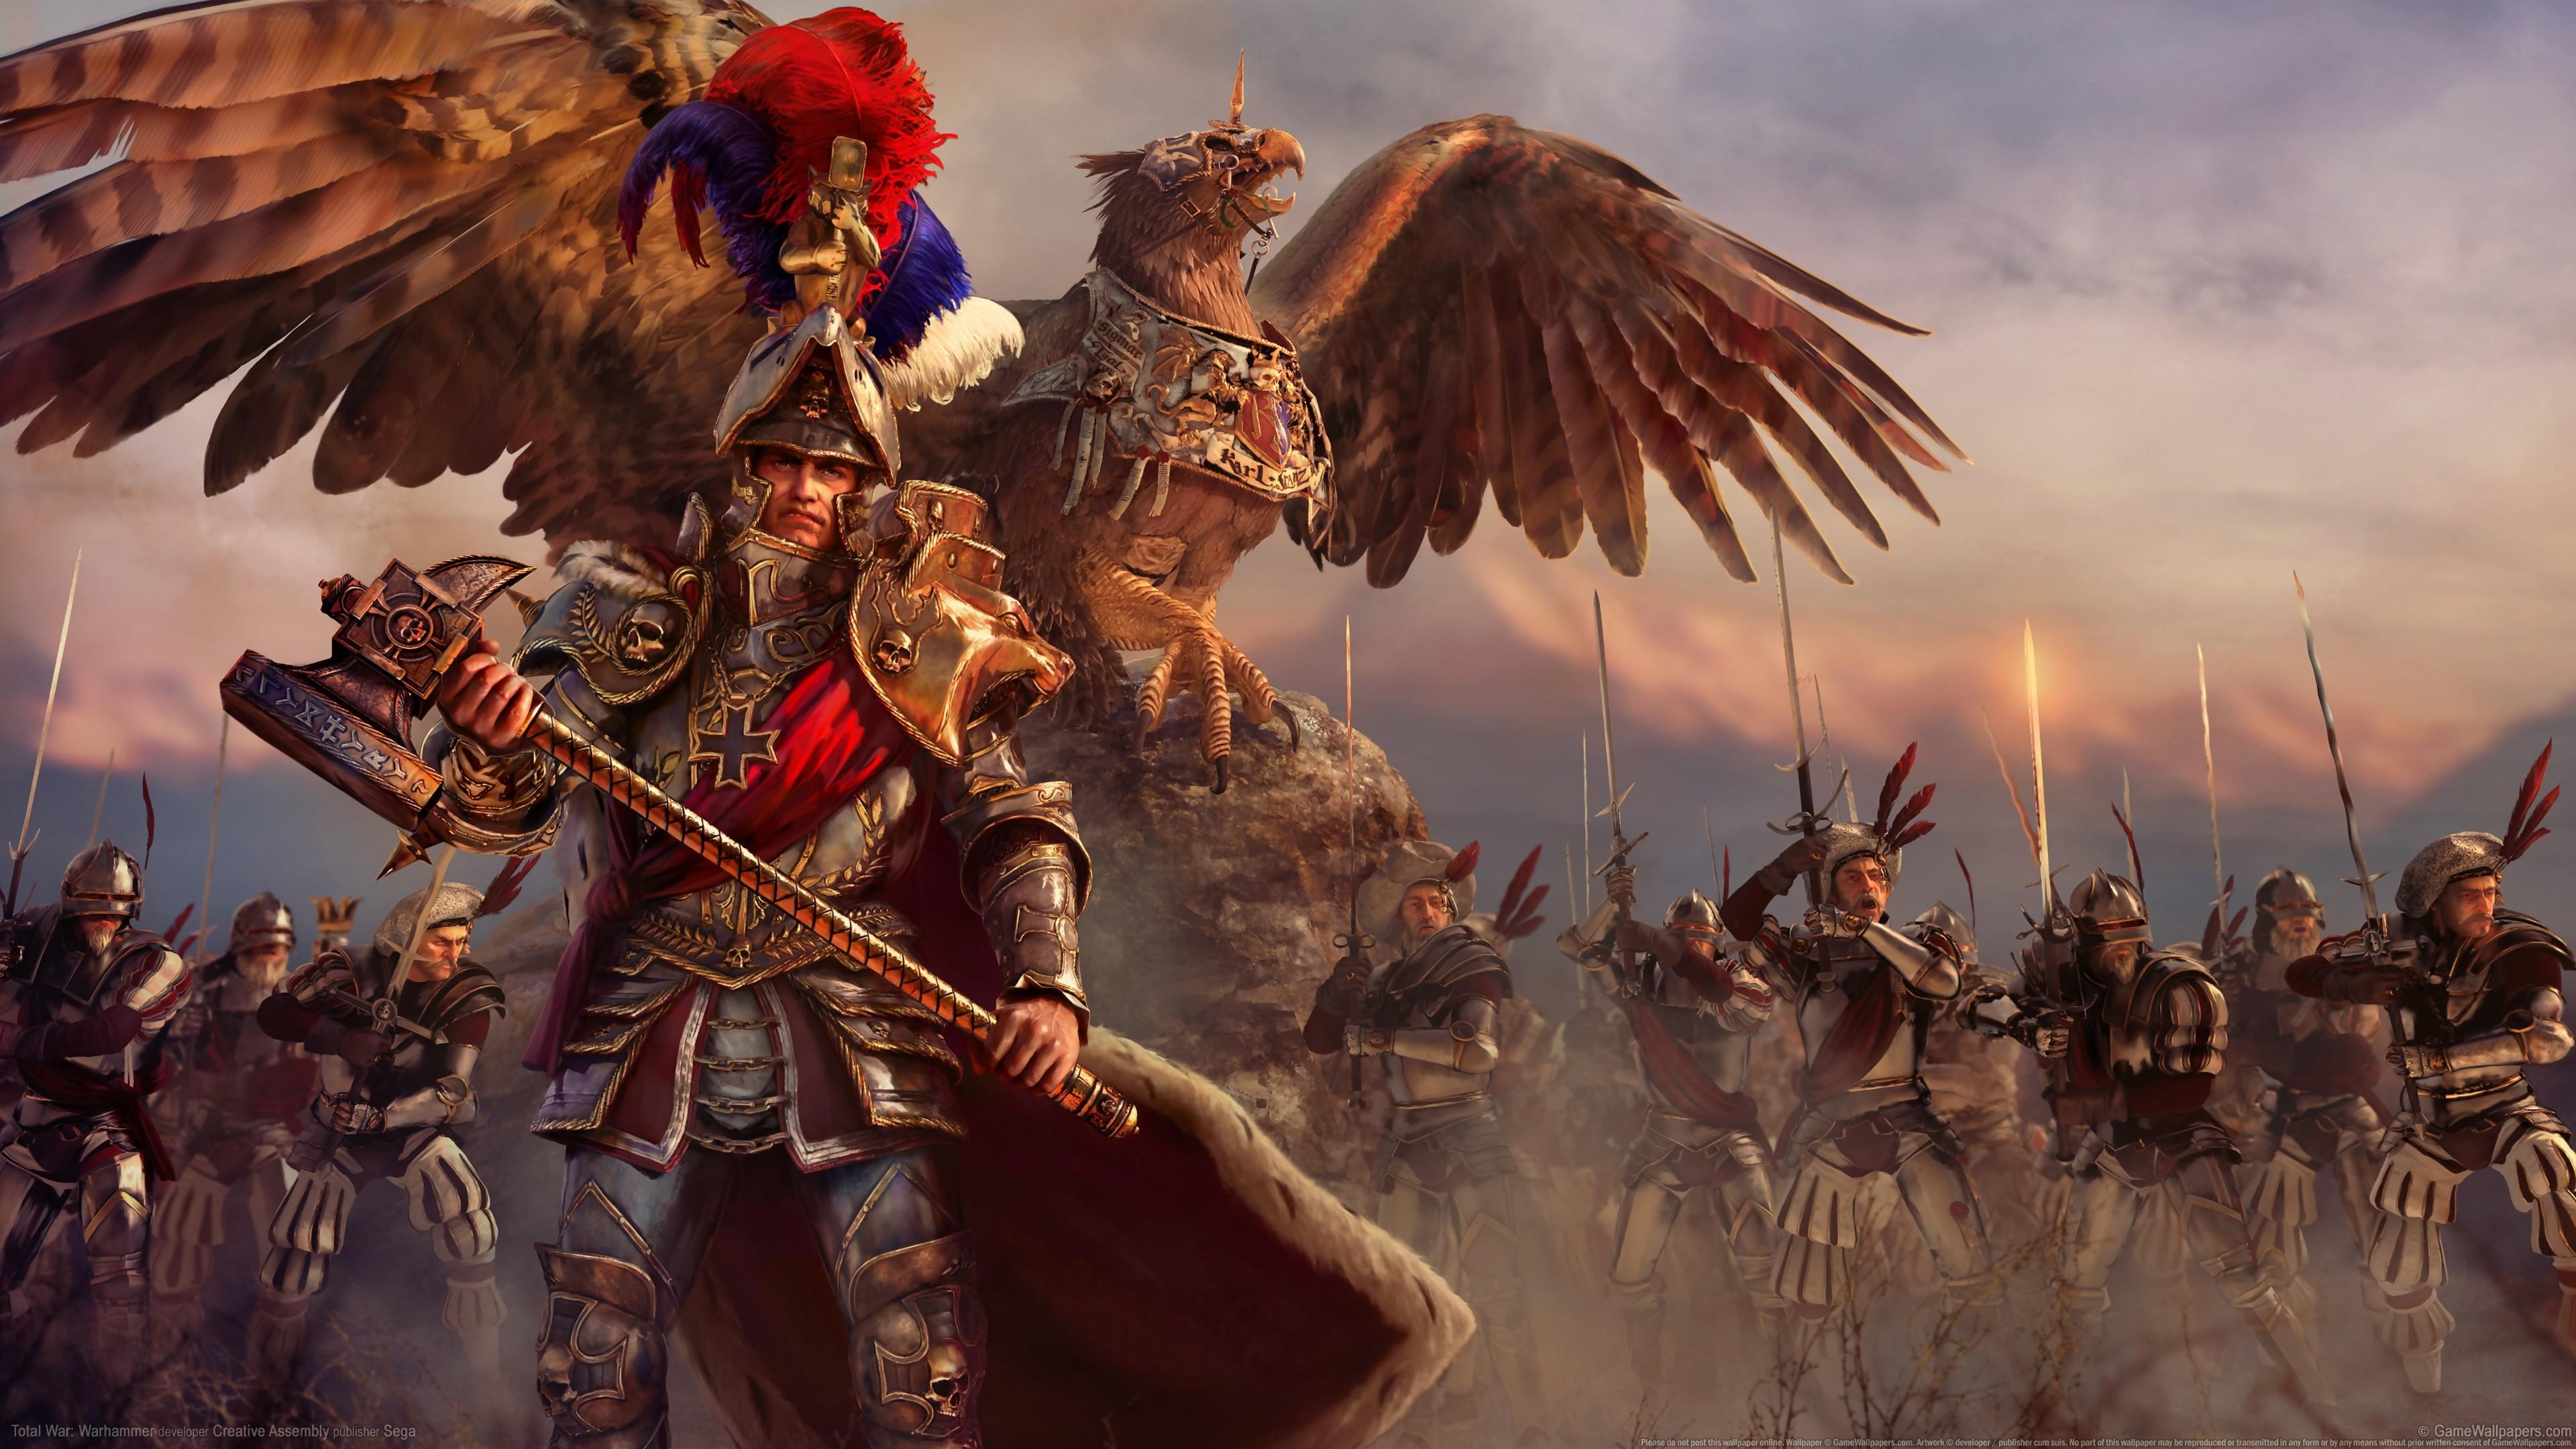 Total War Warhammer 2 Wallpaper: WARHAMMER Avatars